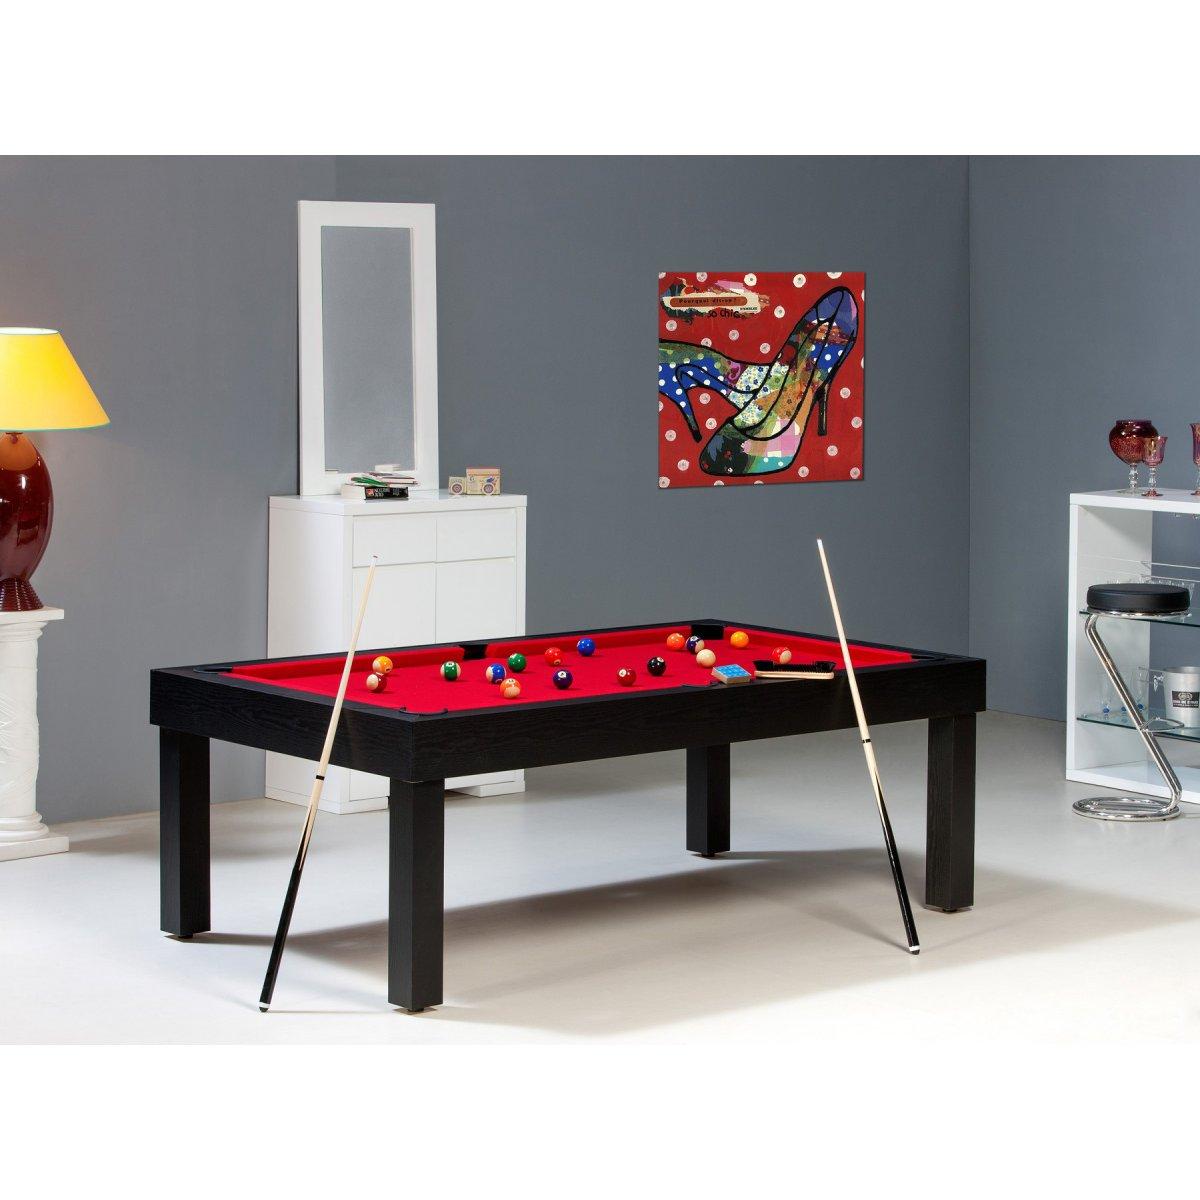 Billard table americain billards de france - Table de billard moderne ...